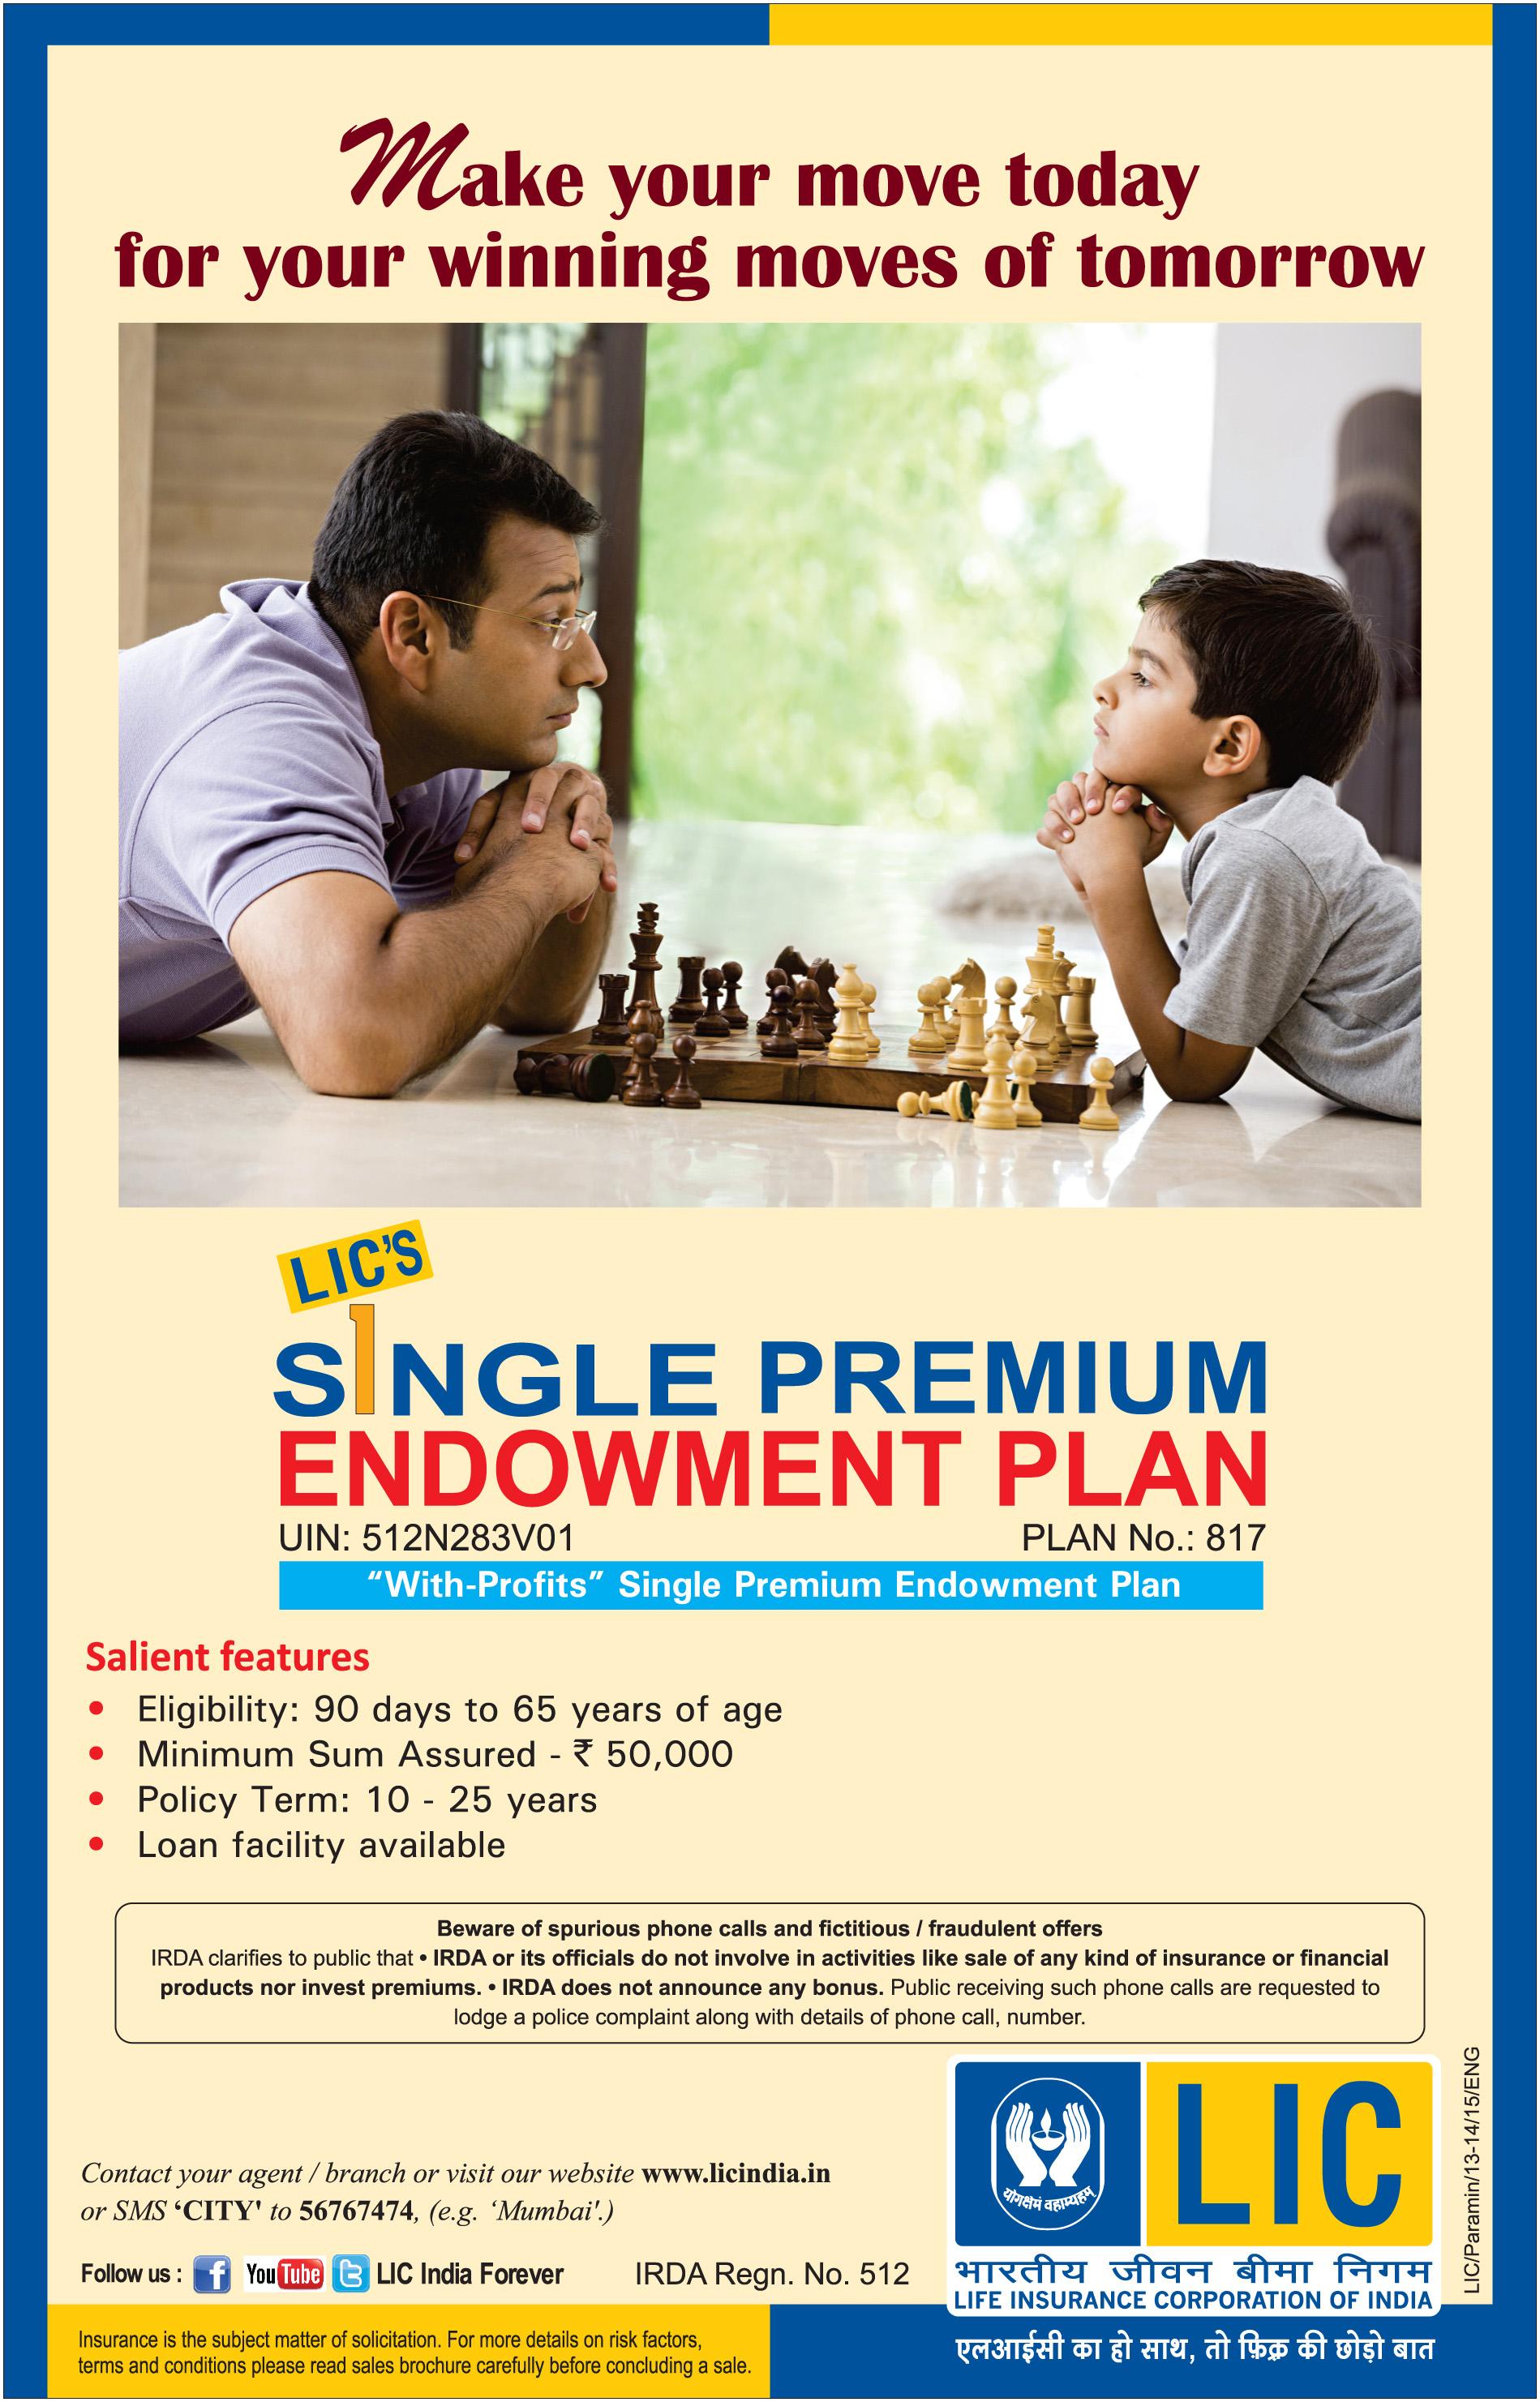 LIC_Single Premium Endowment Plan